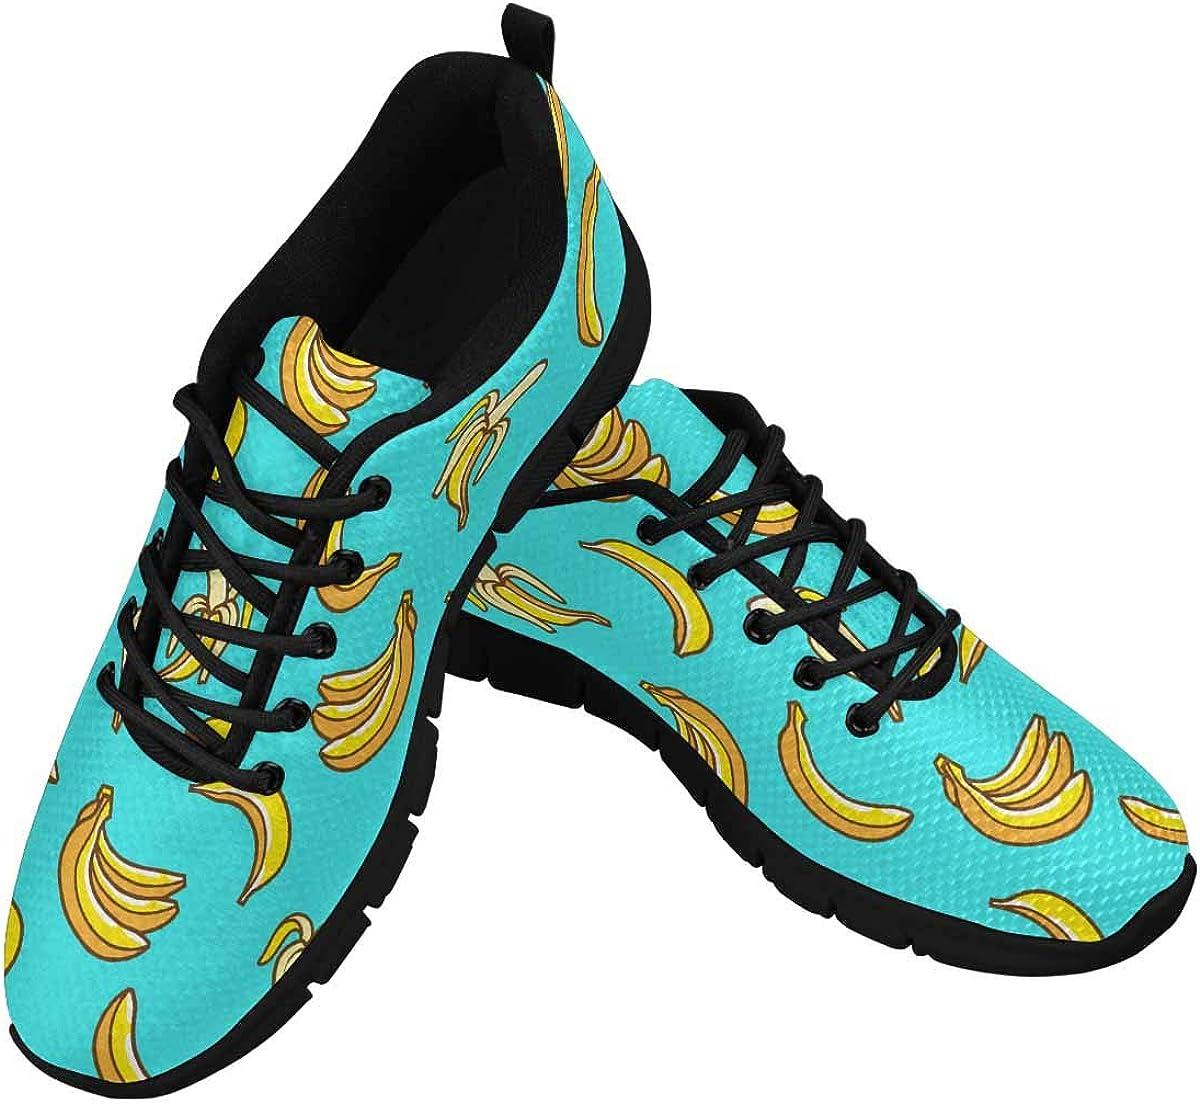 InterestPrint Pattern Bananas Cute Style Women's Walking Shoes Lightweight Casual Running Sneakers